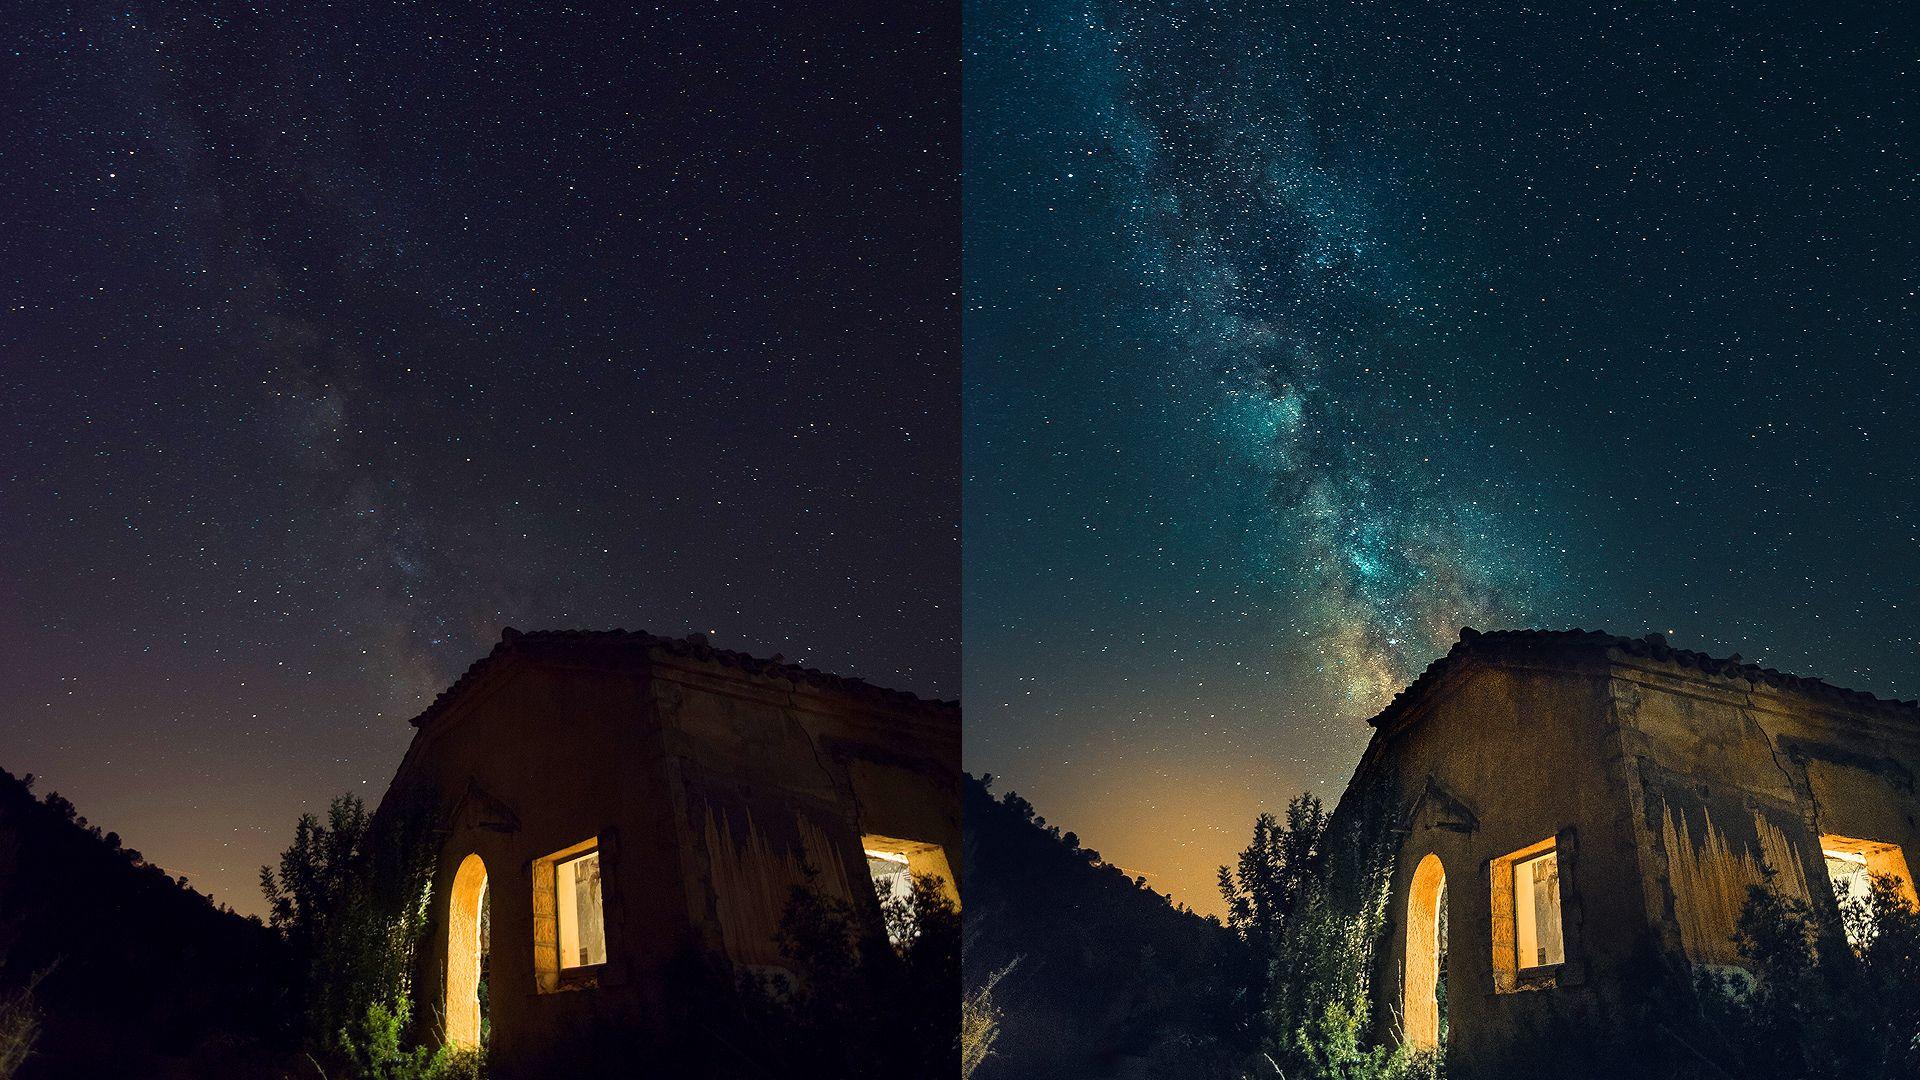 Editing milky way photos